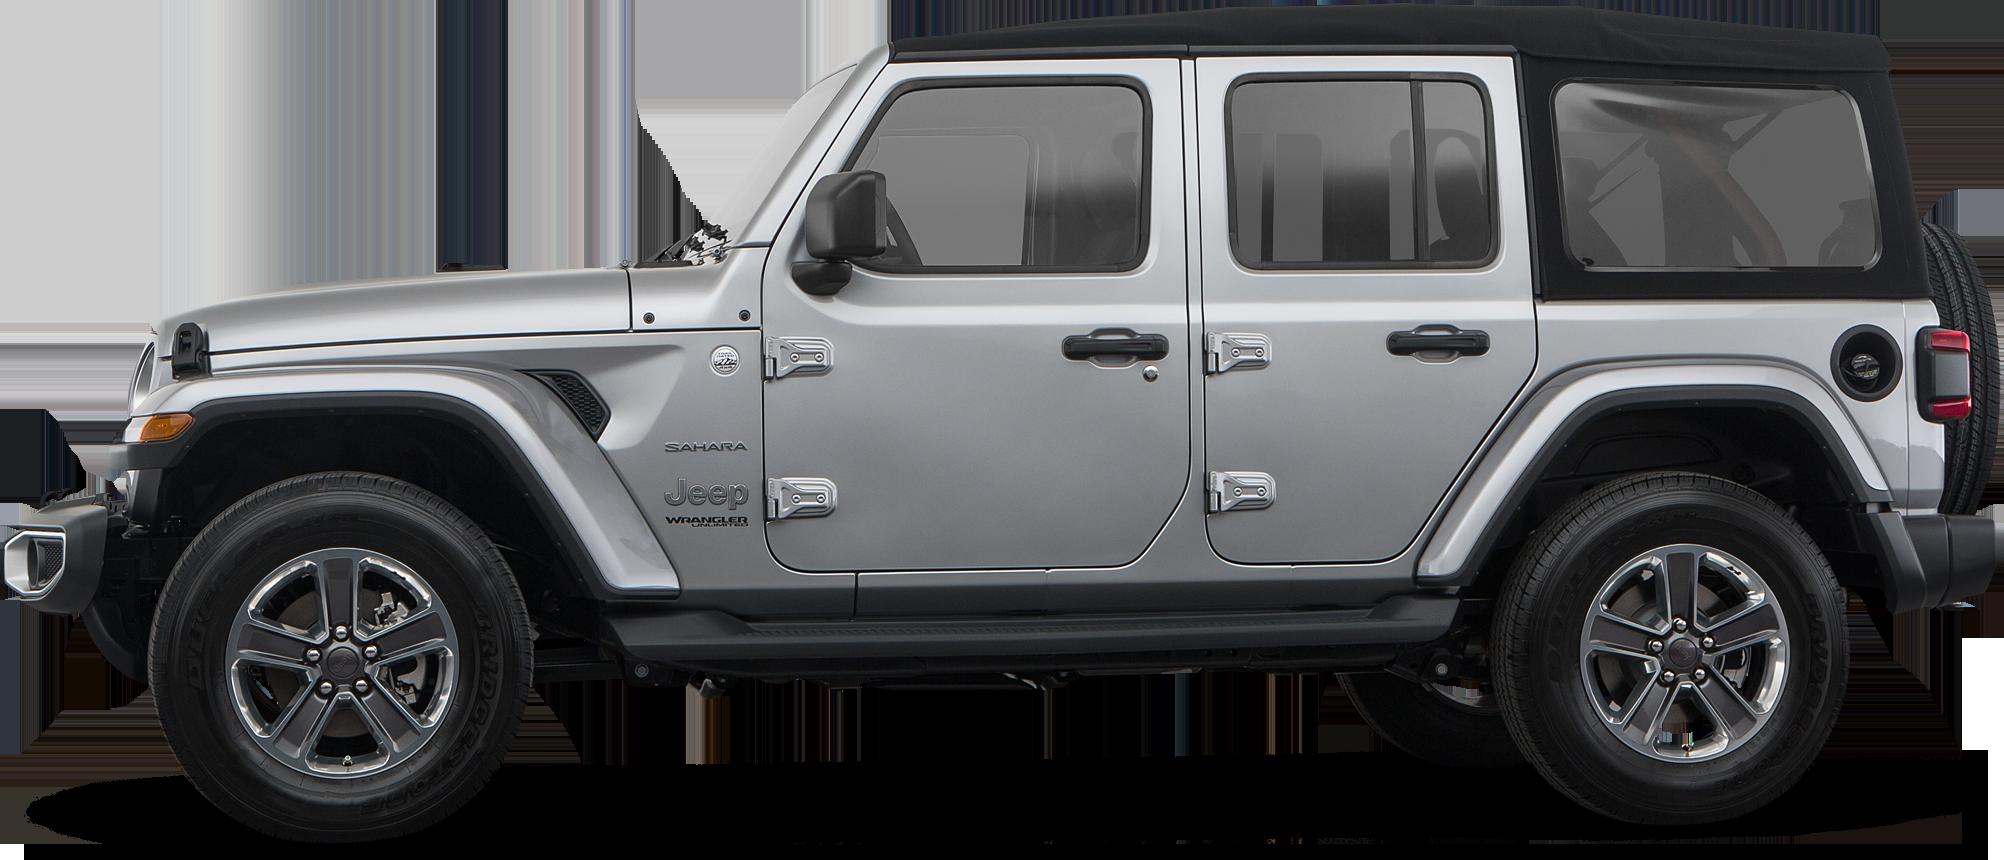 2018 Jeep Wrangler Suv Charleston Parts Book Unlimited Sahara 4x4